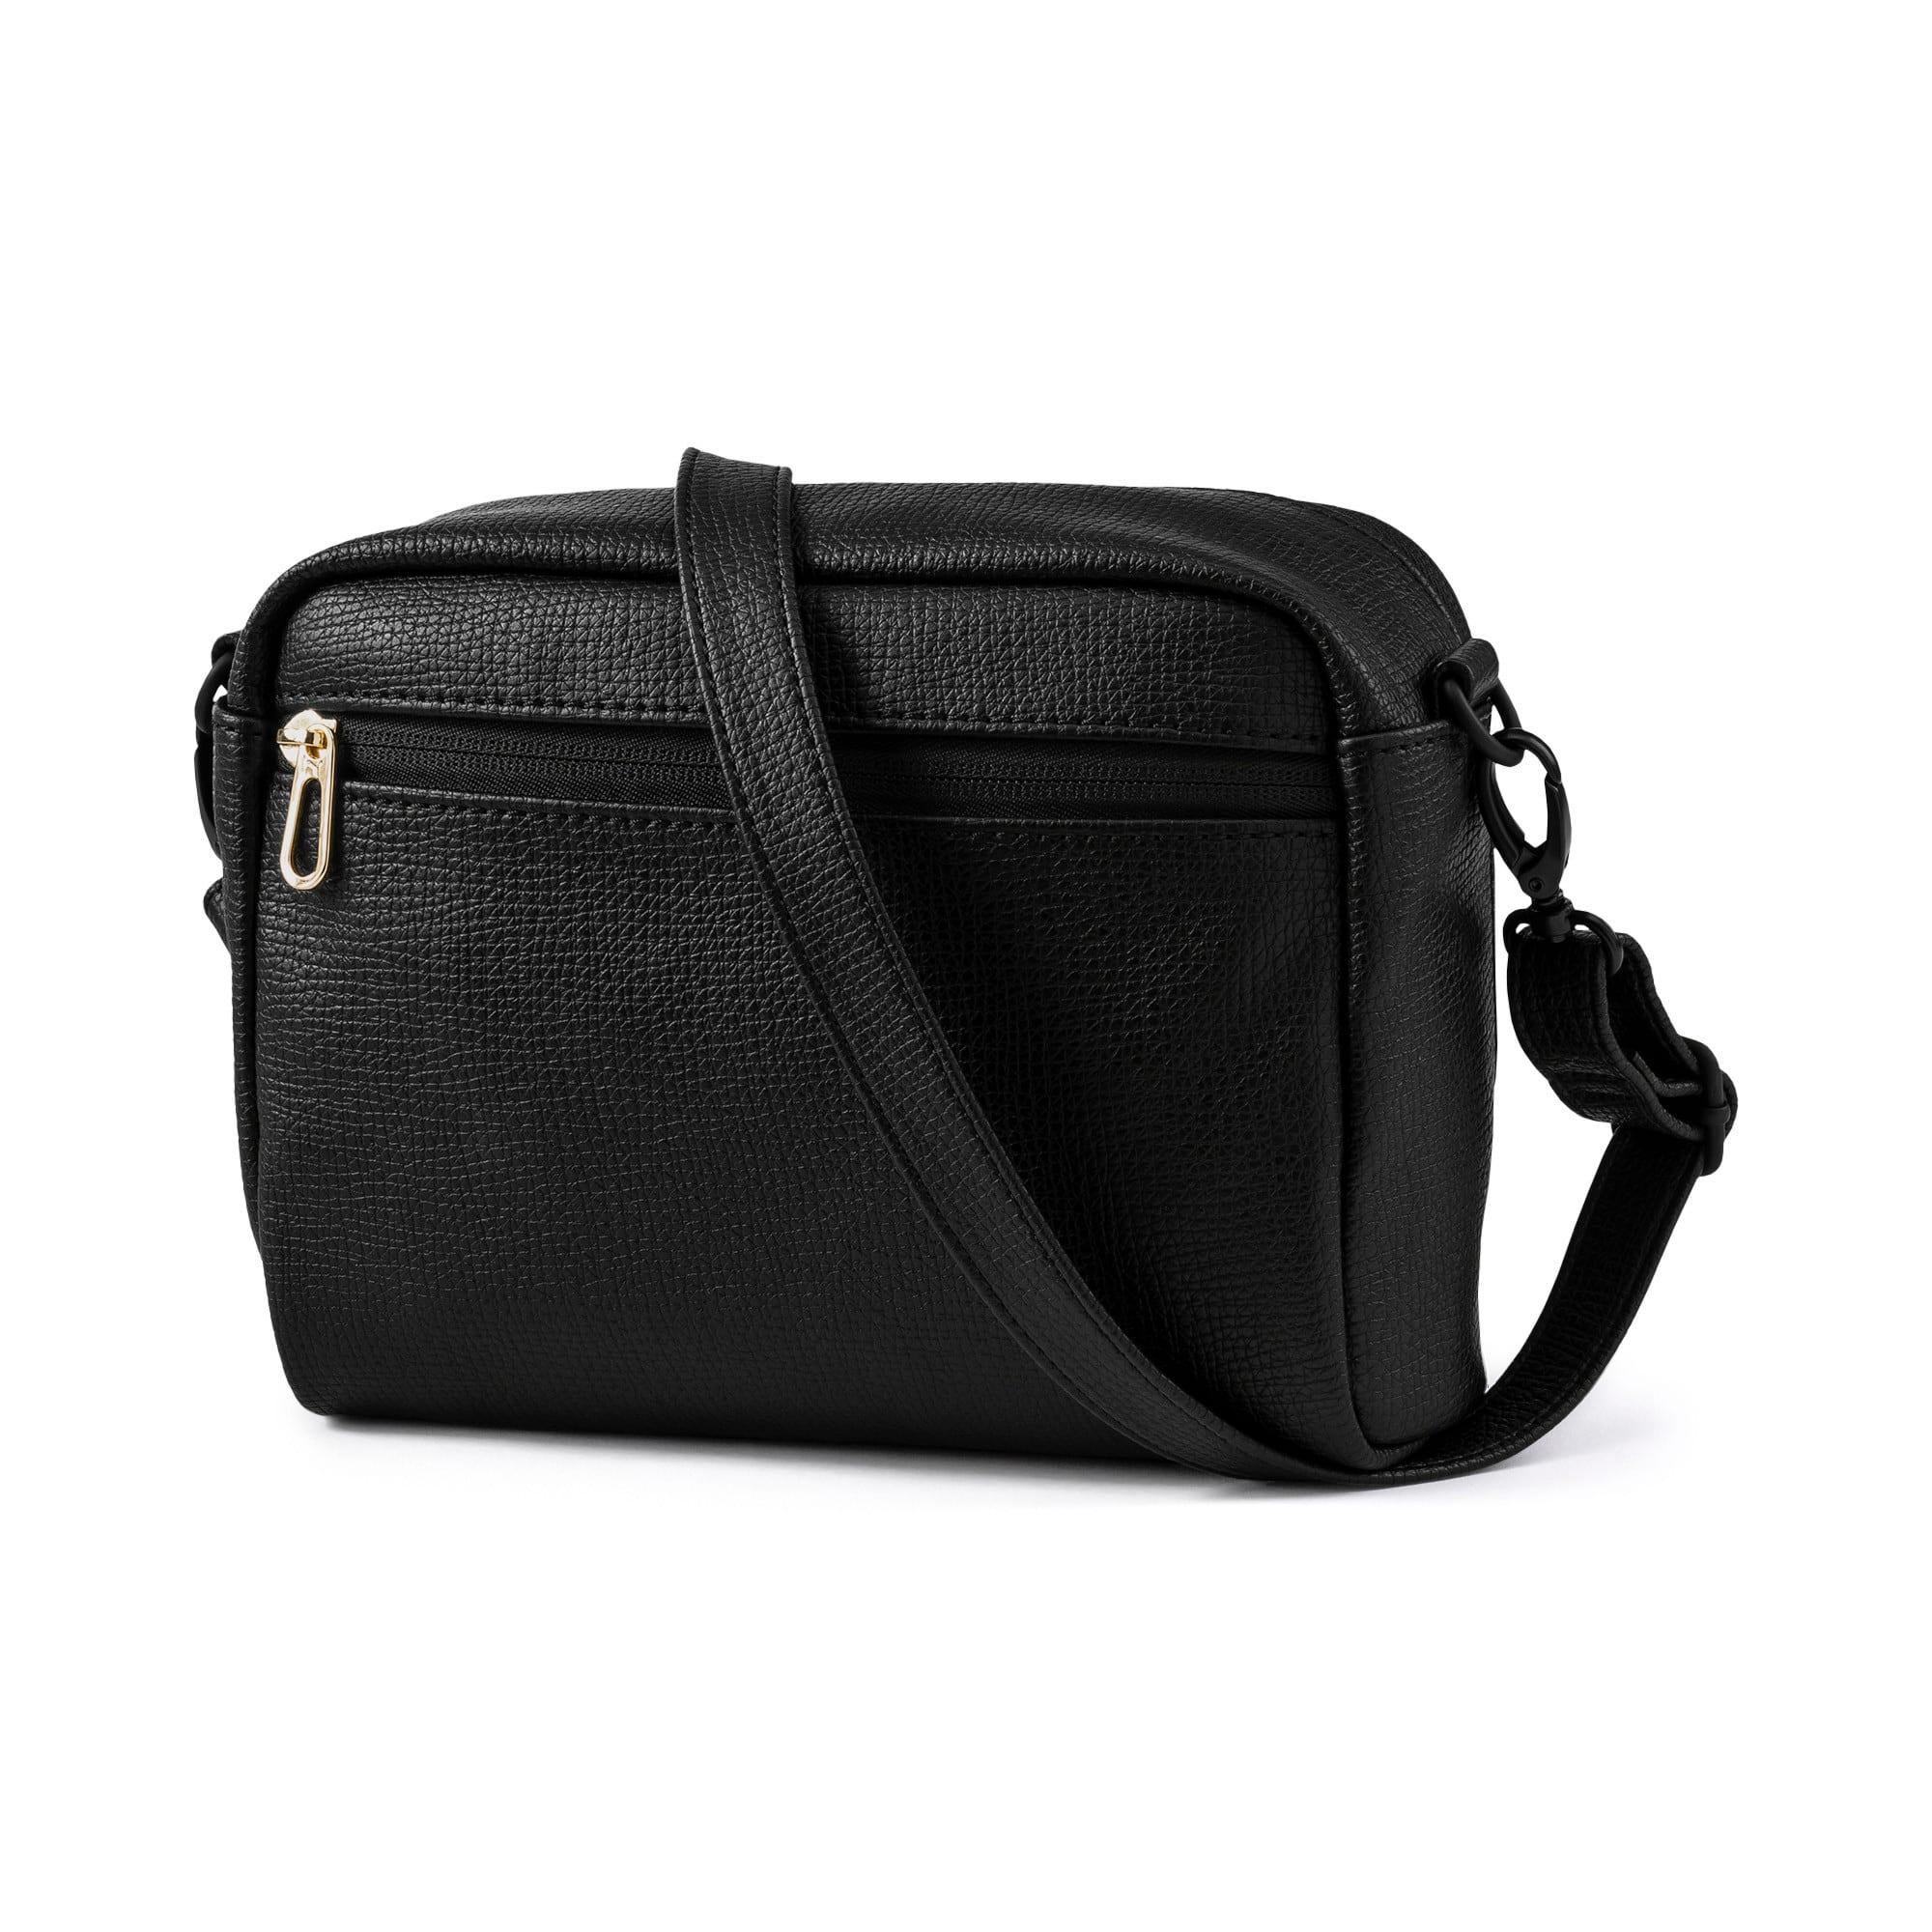 Thumbnail 3 of PUMA x Ferrari Mini Women's handbag, Puma Black, medium-IND